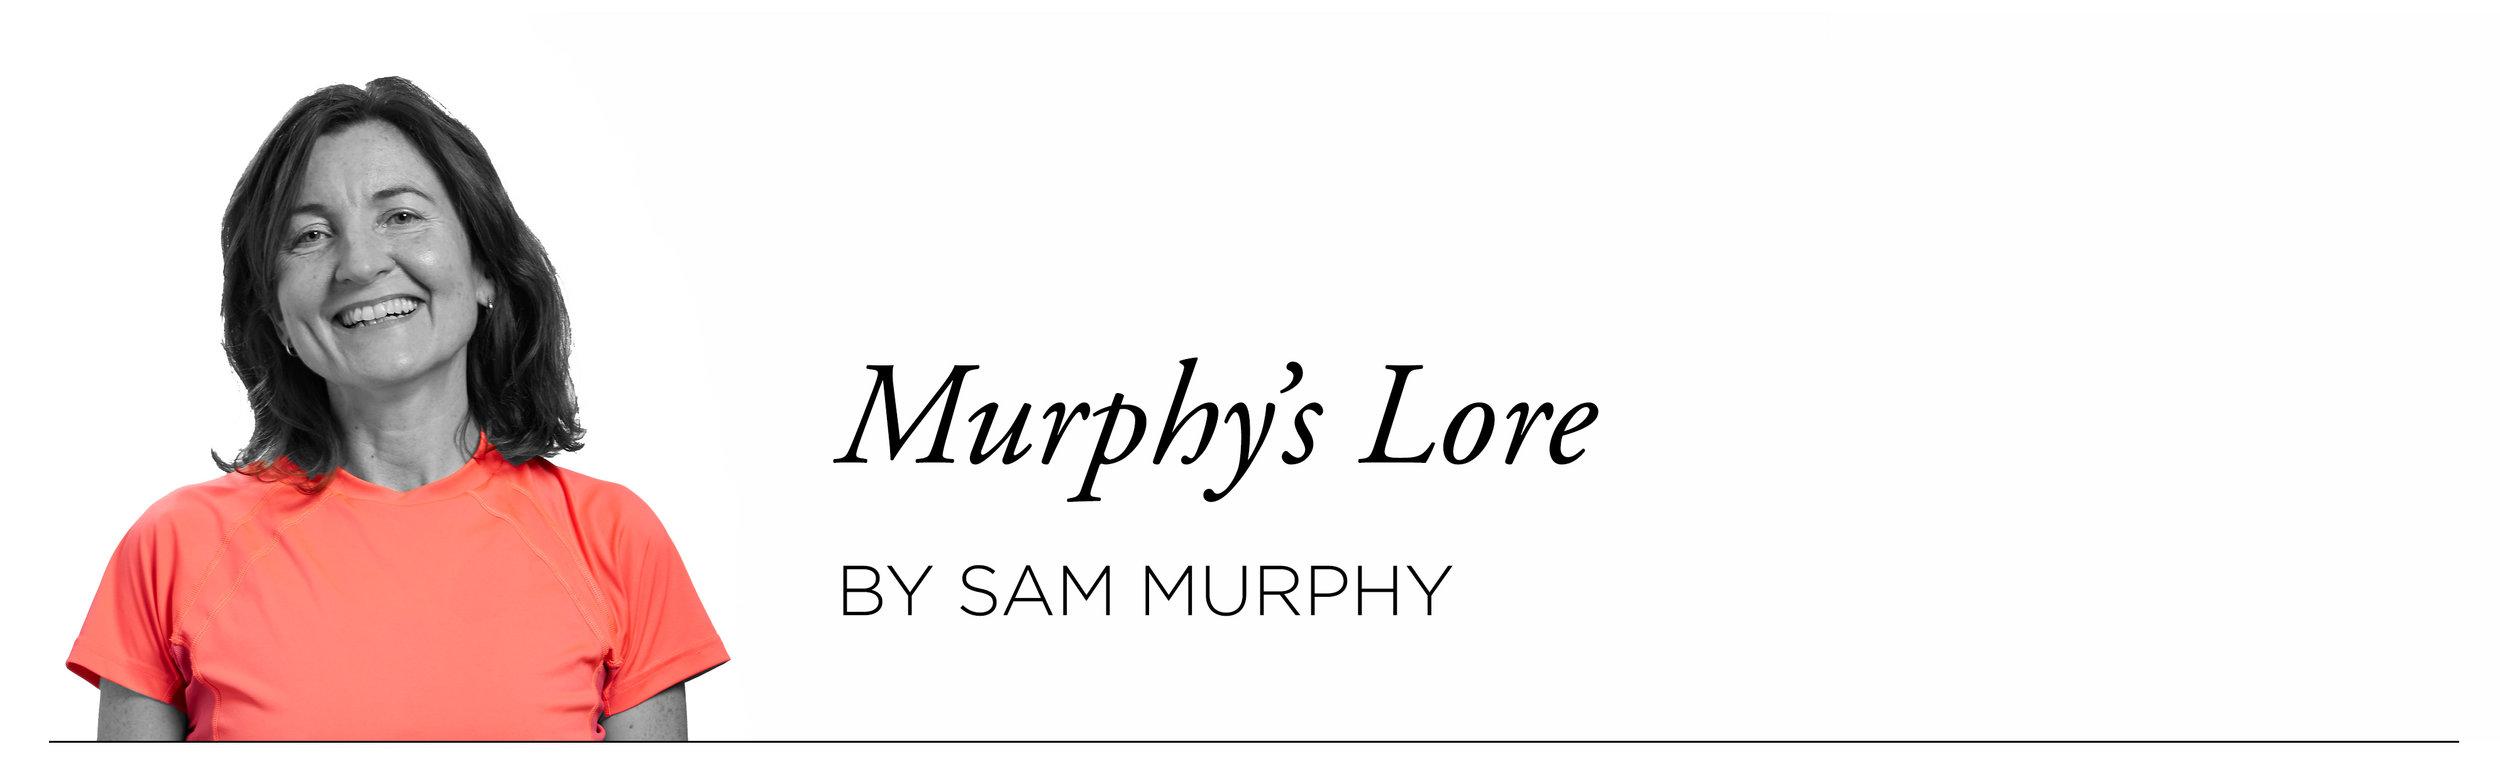 murphys_lore_2.jpg